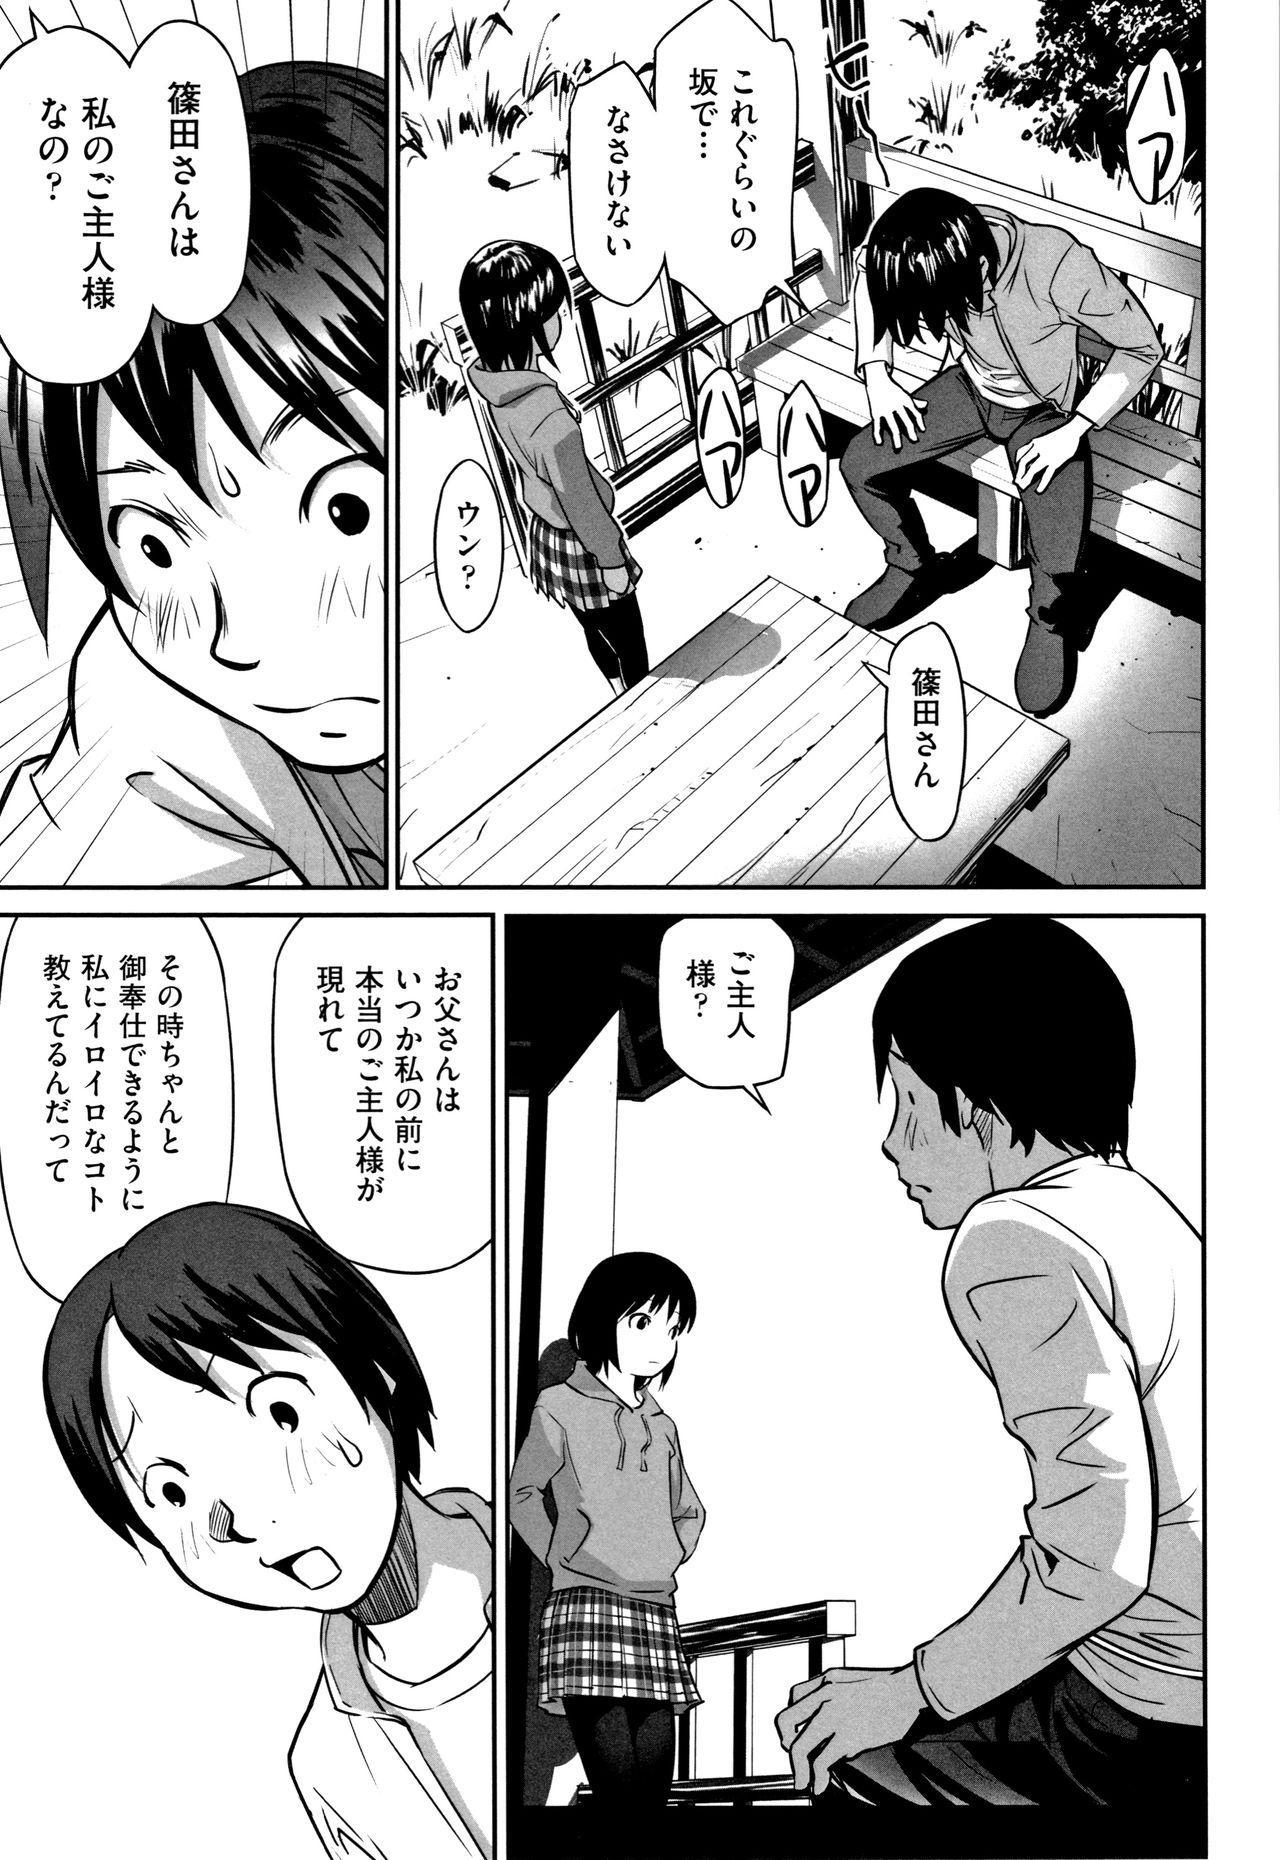 Shoujo Kumikyoku 11 165